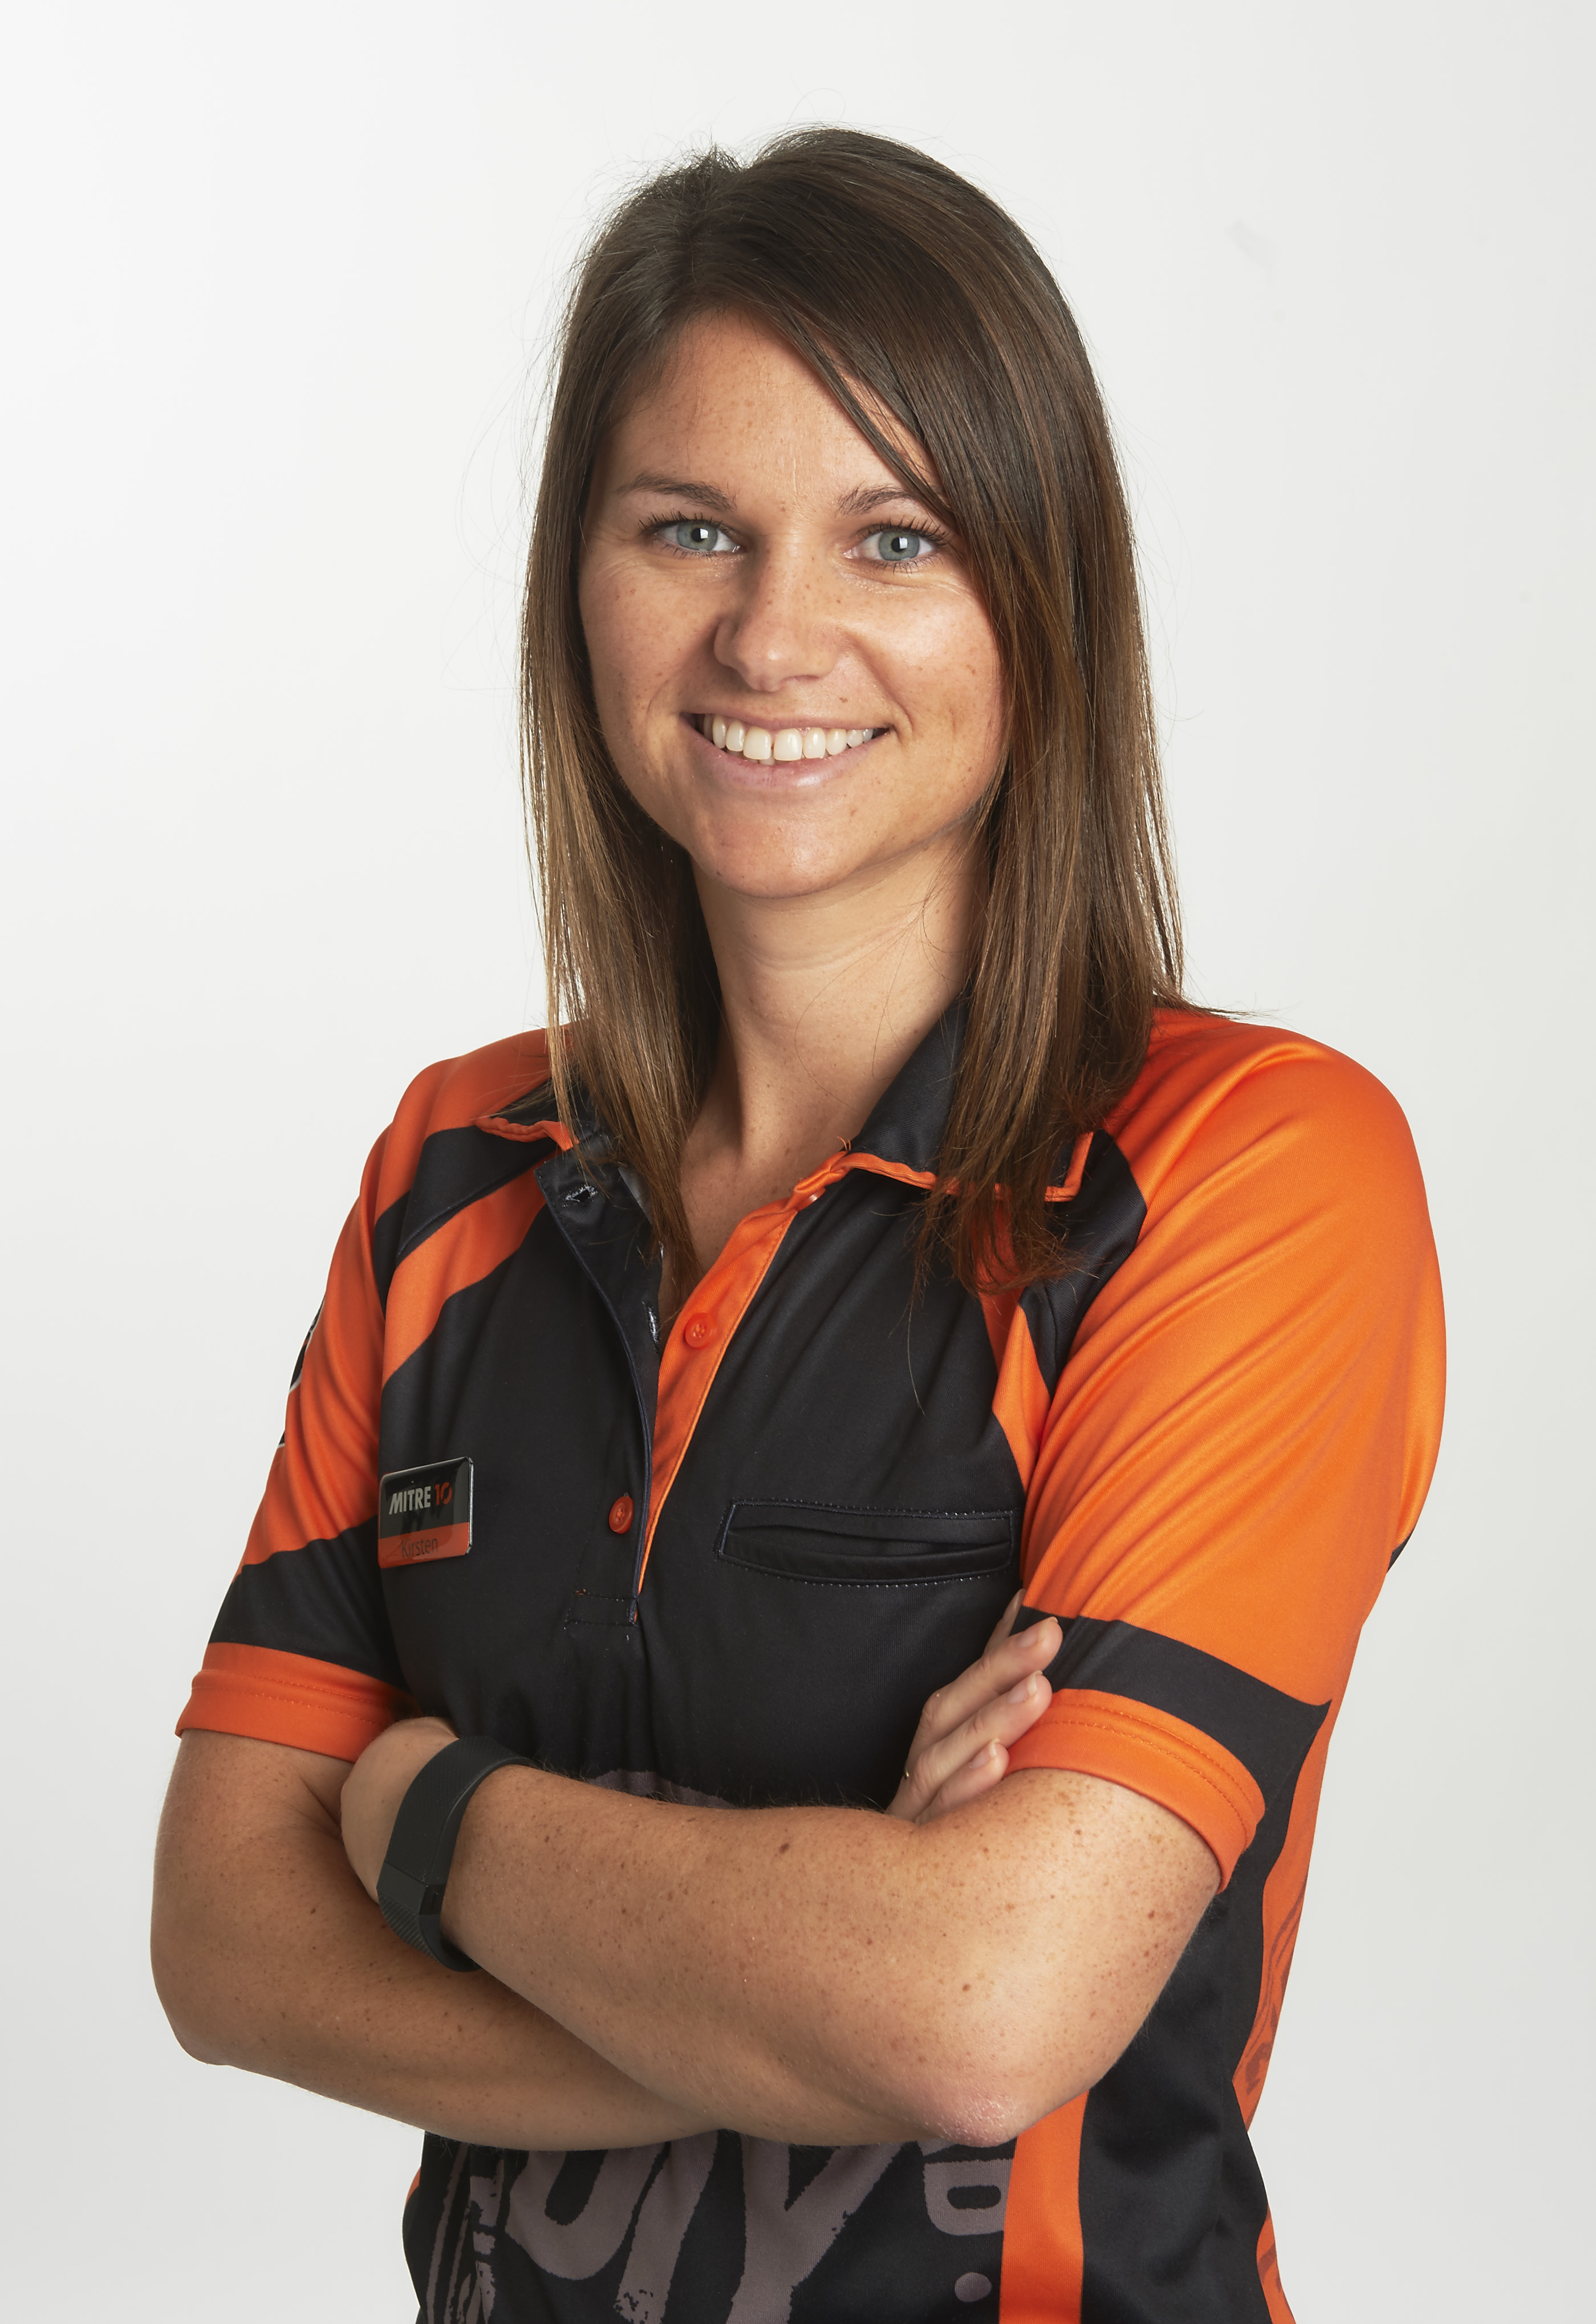 Kirsten Riechelmann